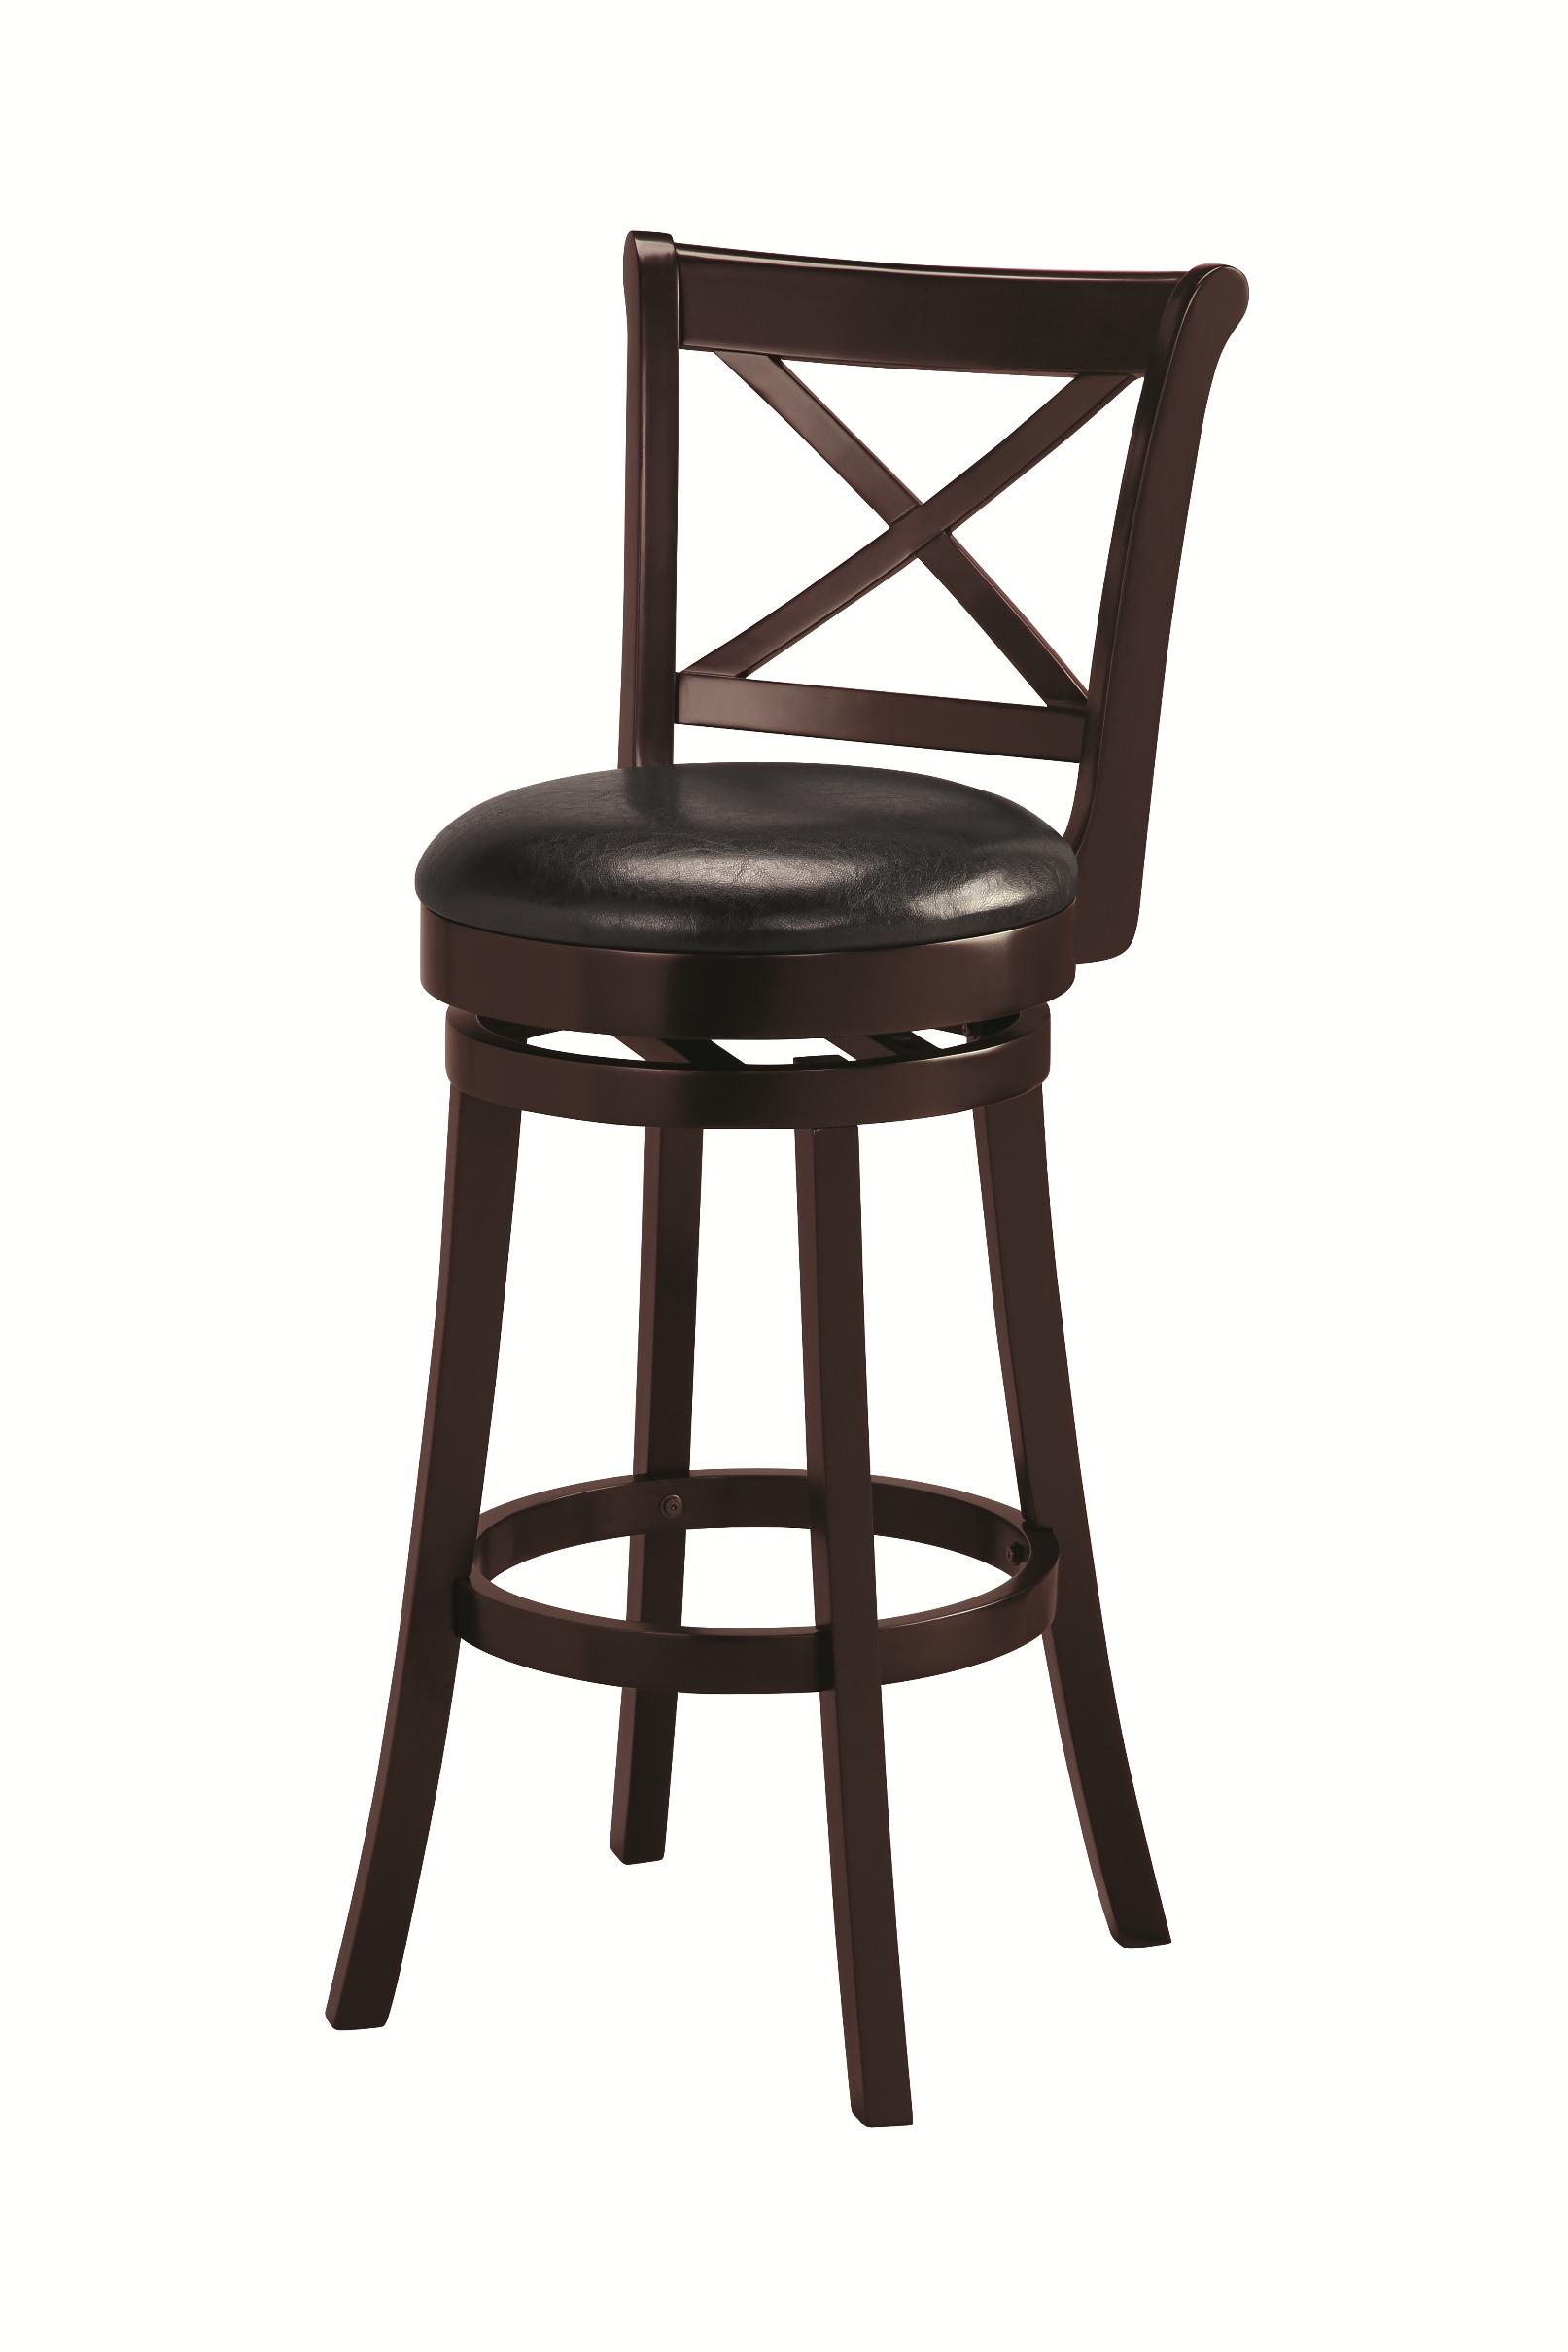 plush leather chair vibrating massage kmart